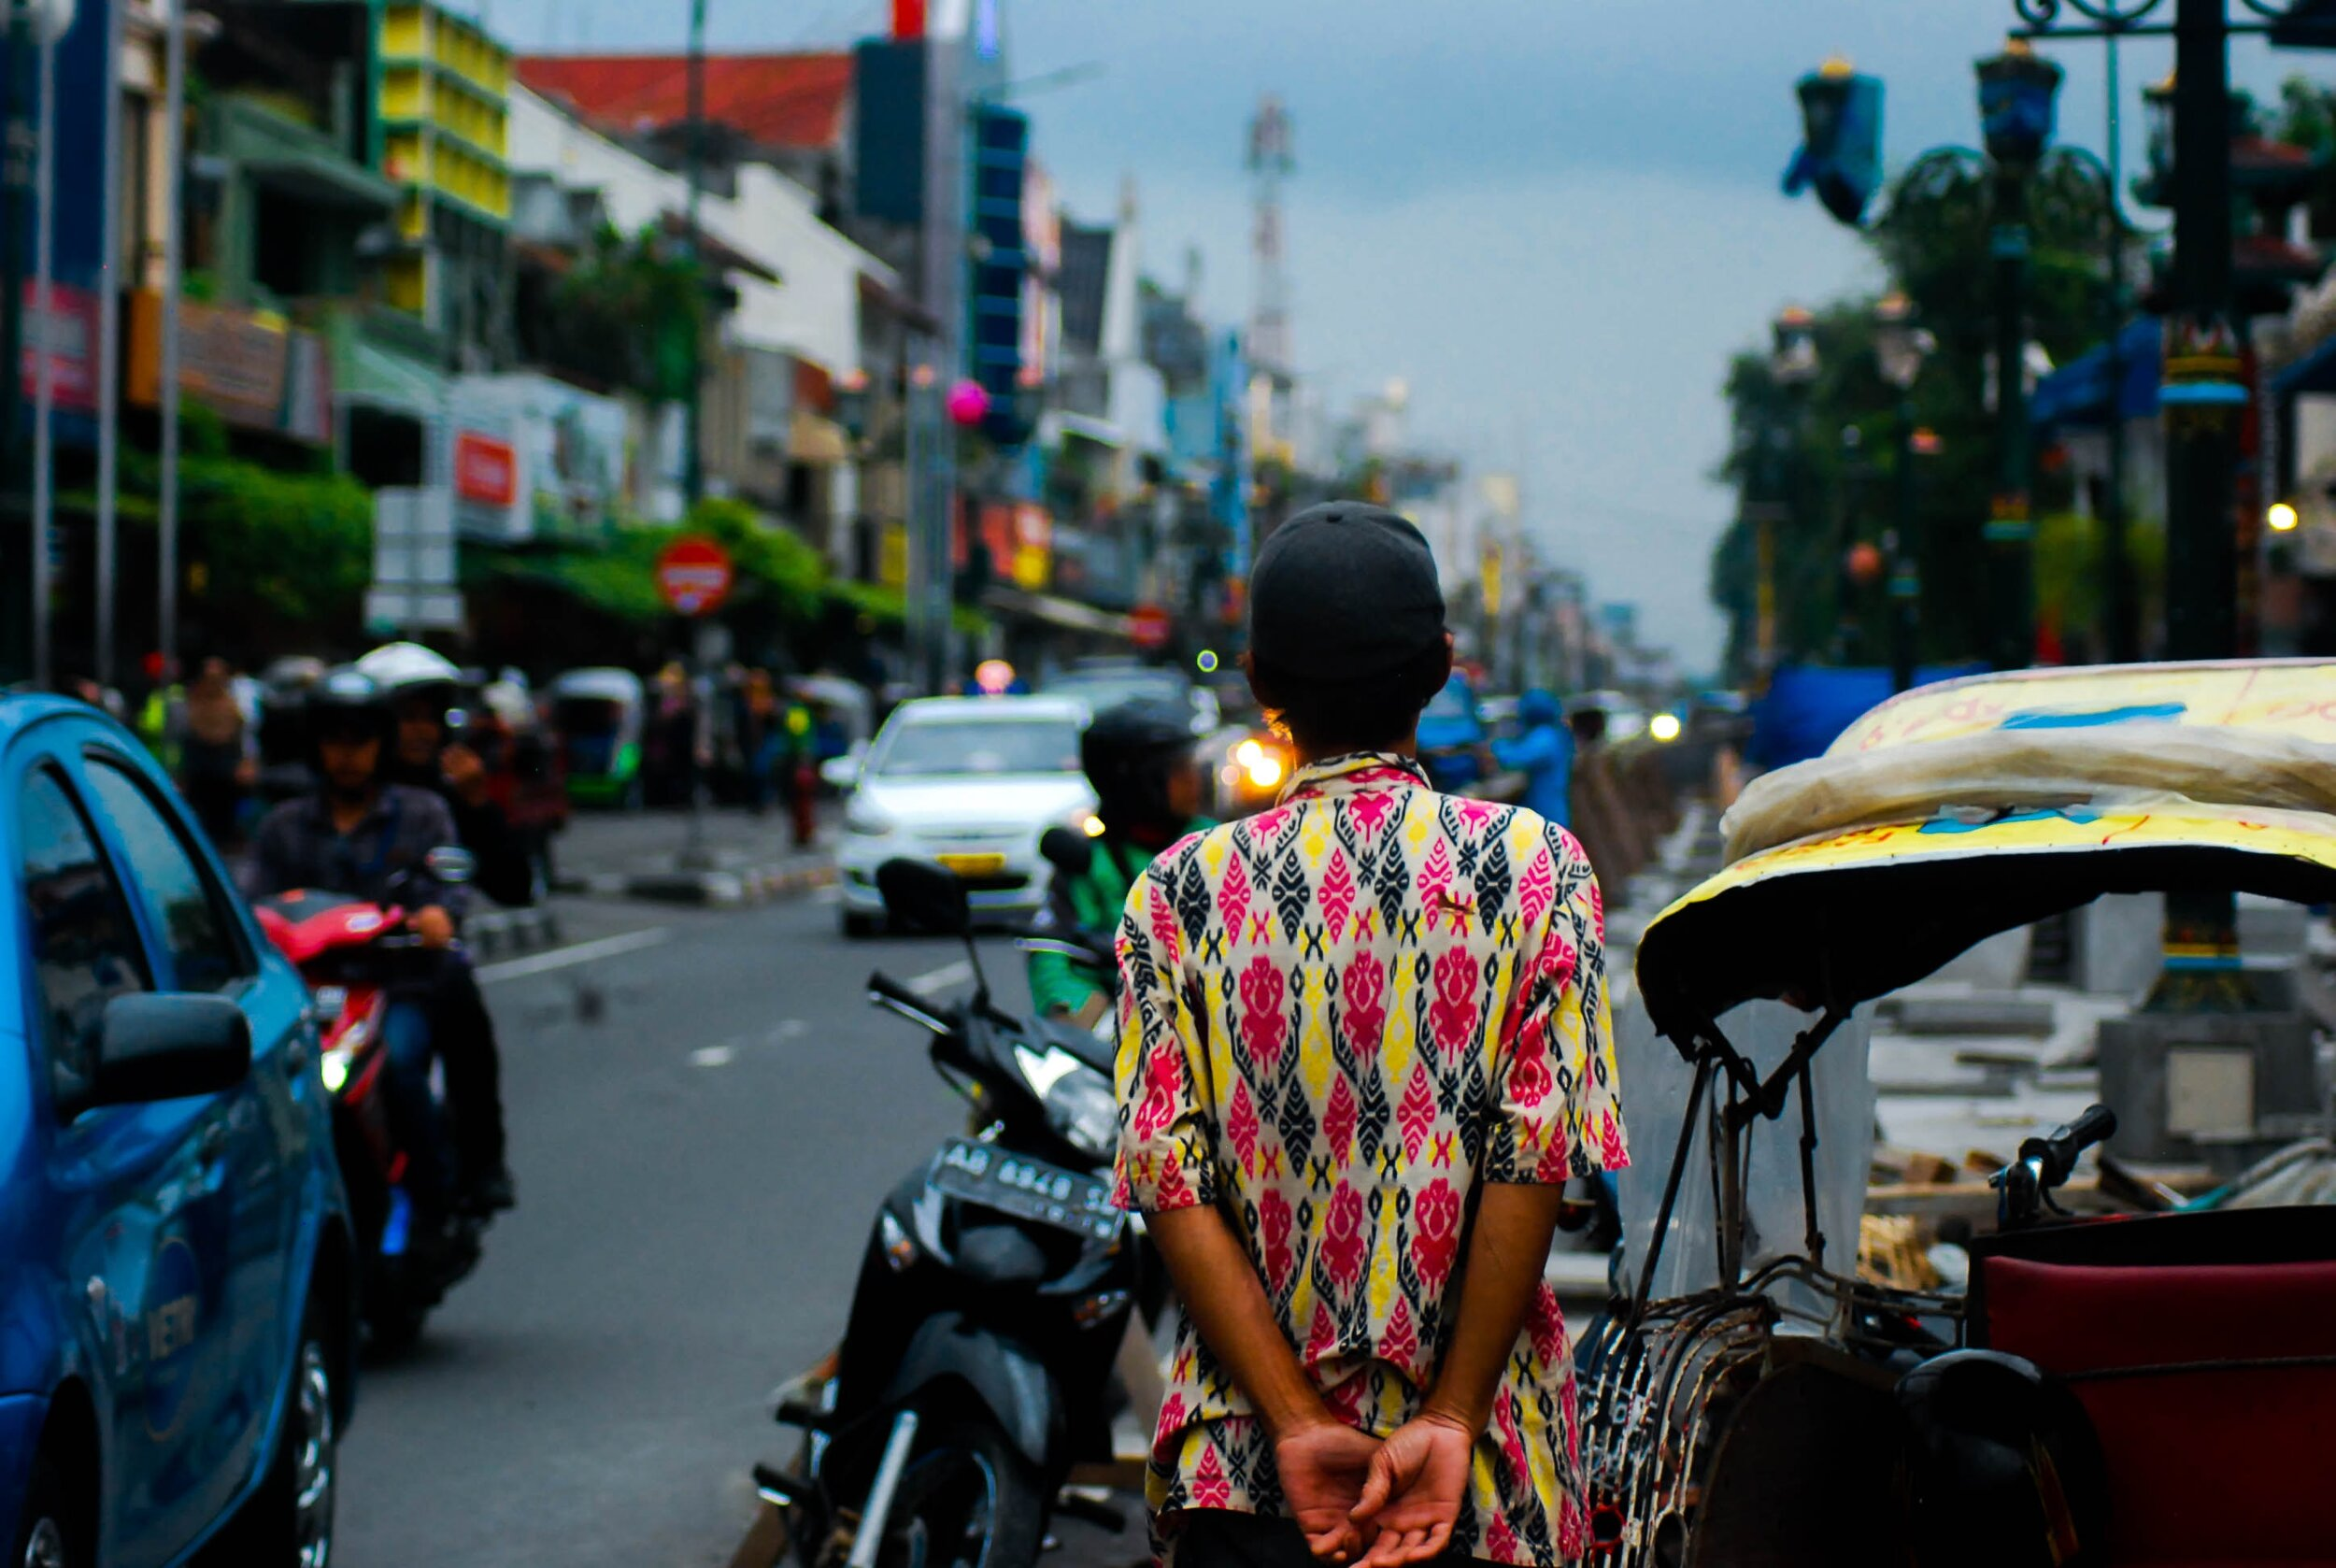 INDONESIASEPT/OCT -